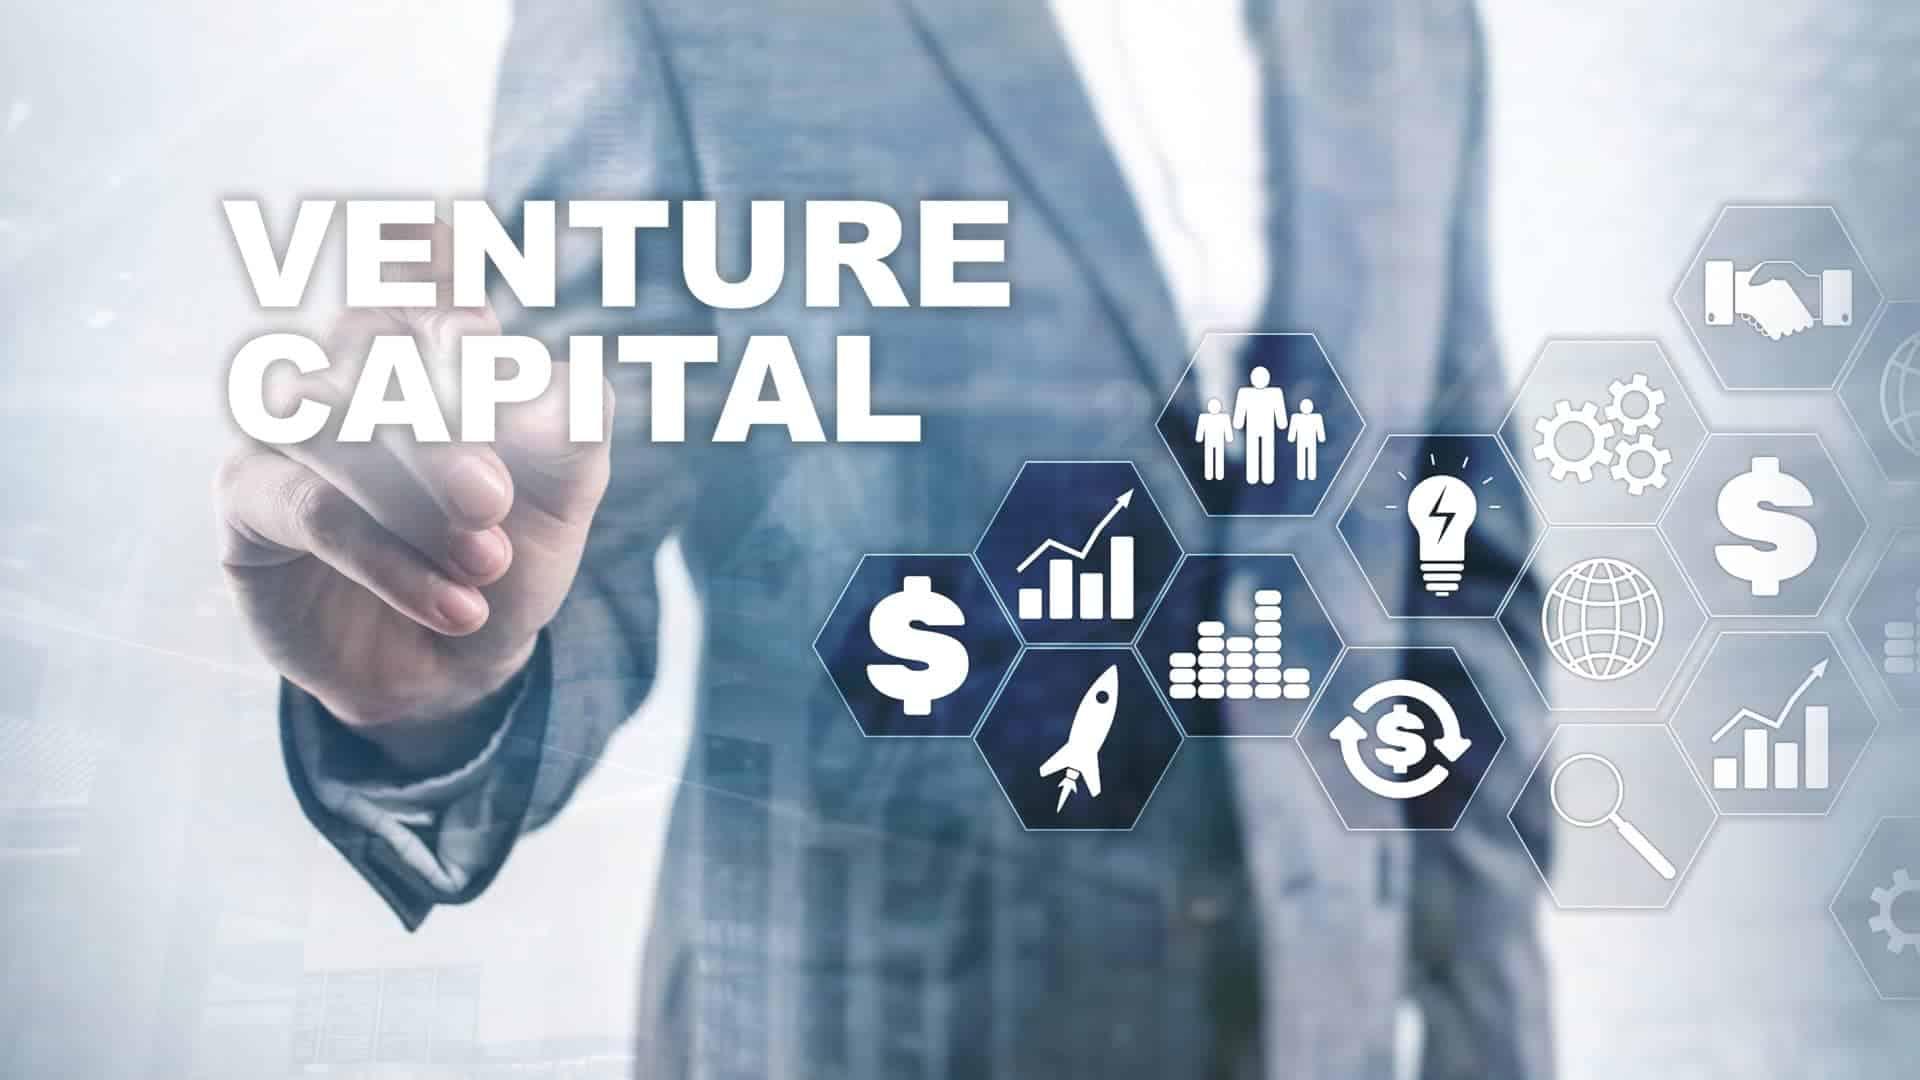 venture capital firms for tech startups